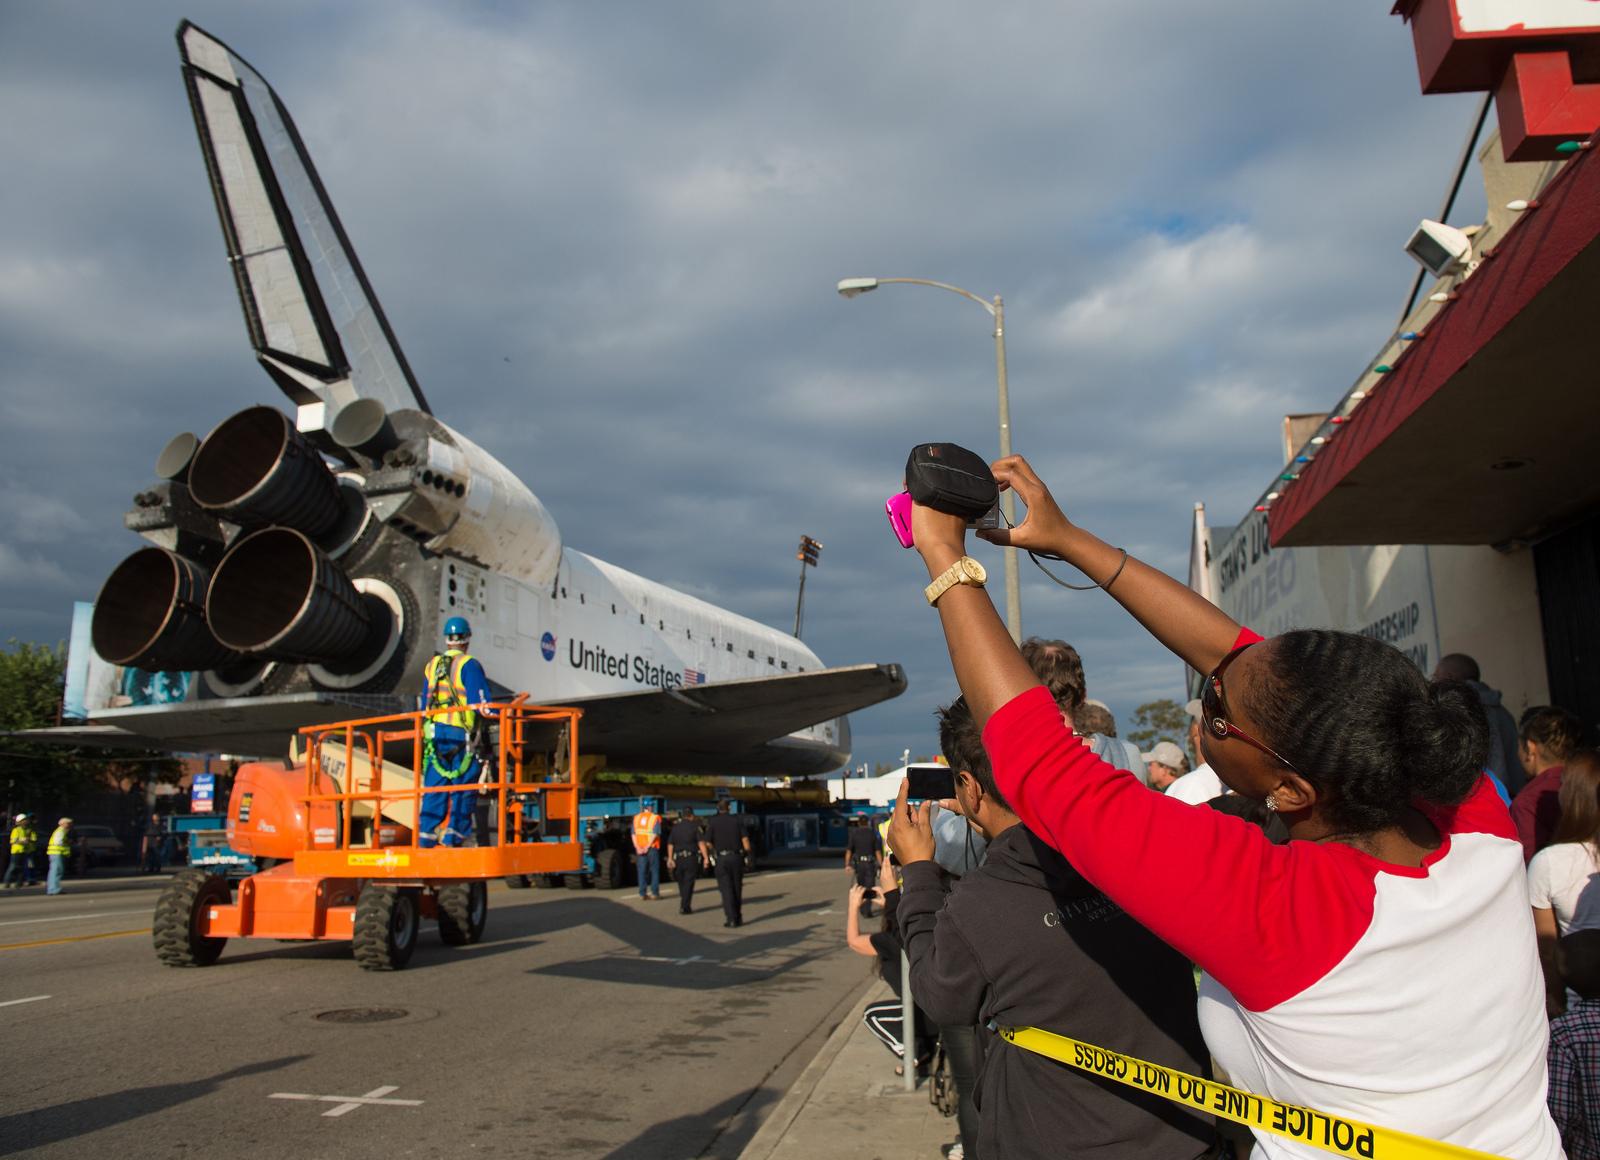 Shuttle Endeavour on L.A. Streets: Paparazzi